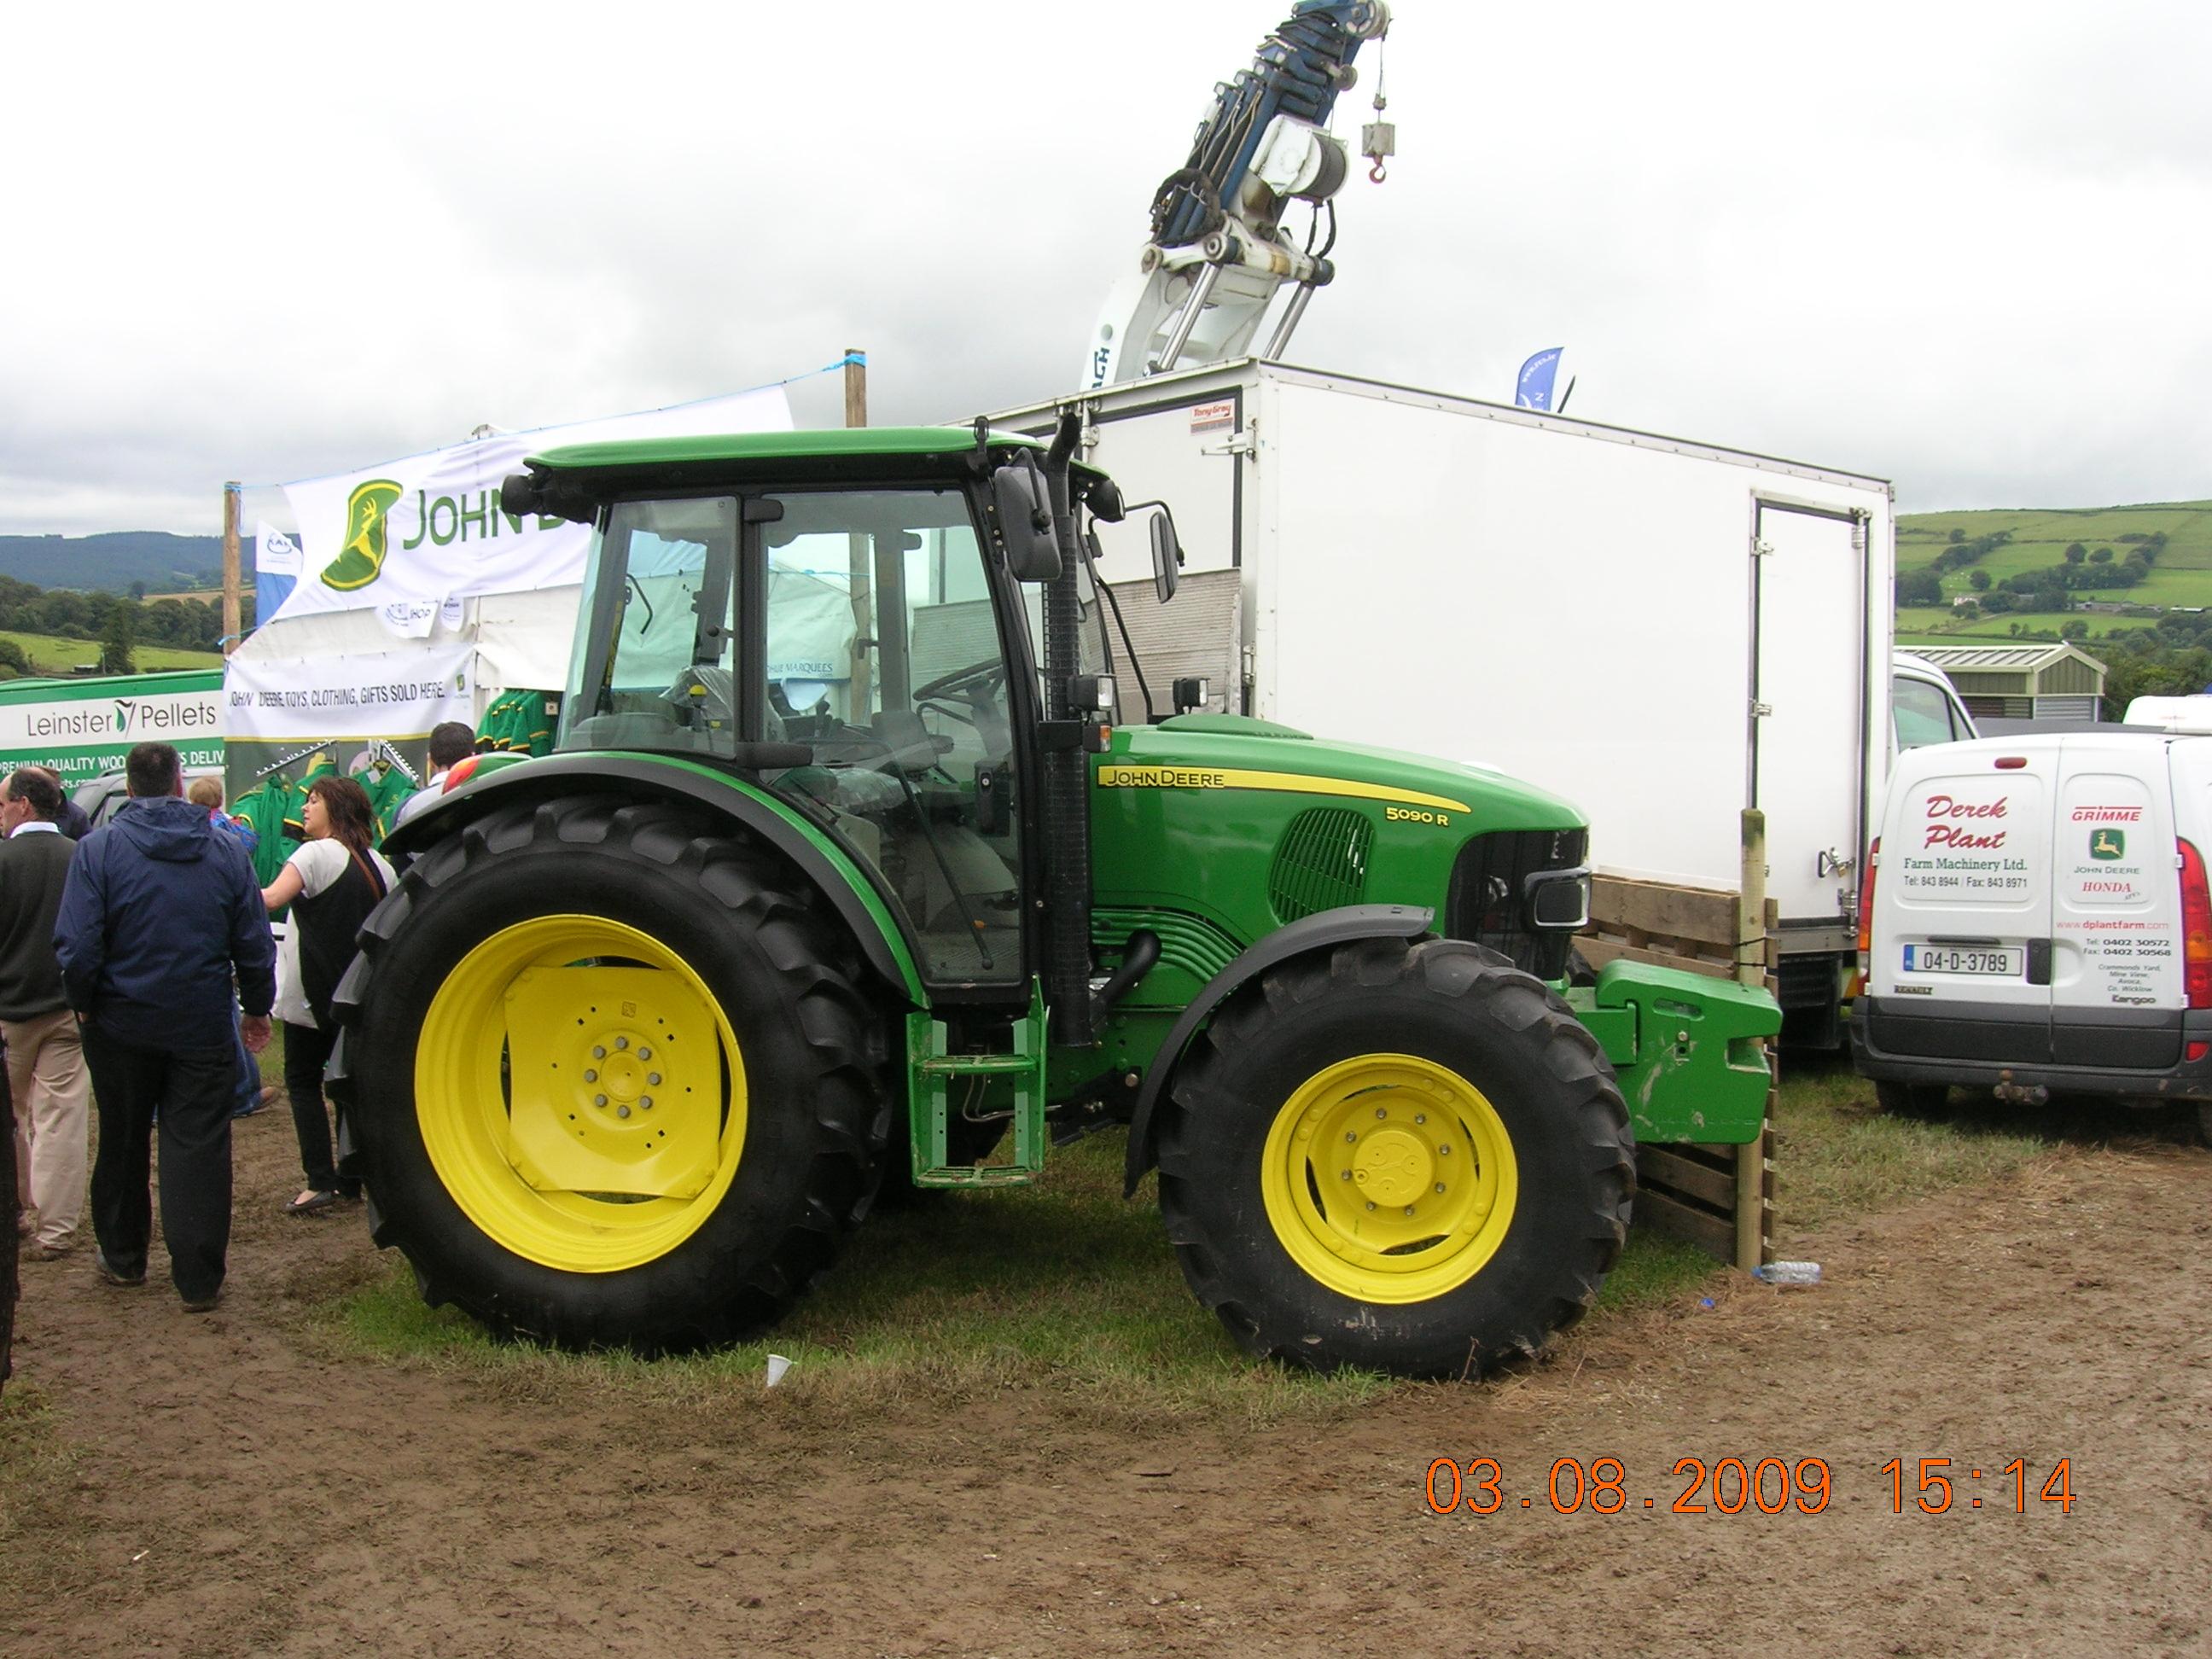 John Deere 5090R Tractor | Explore nivago's photos on ...